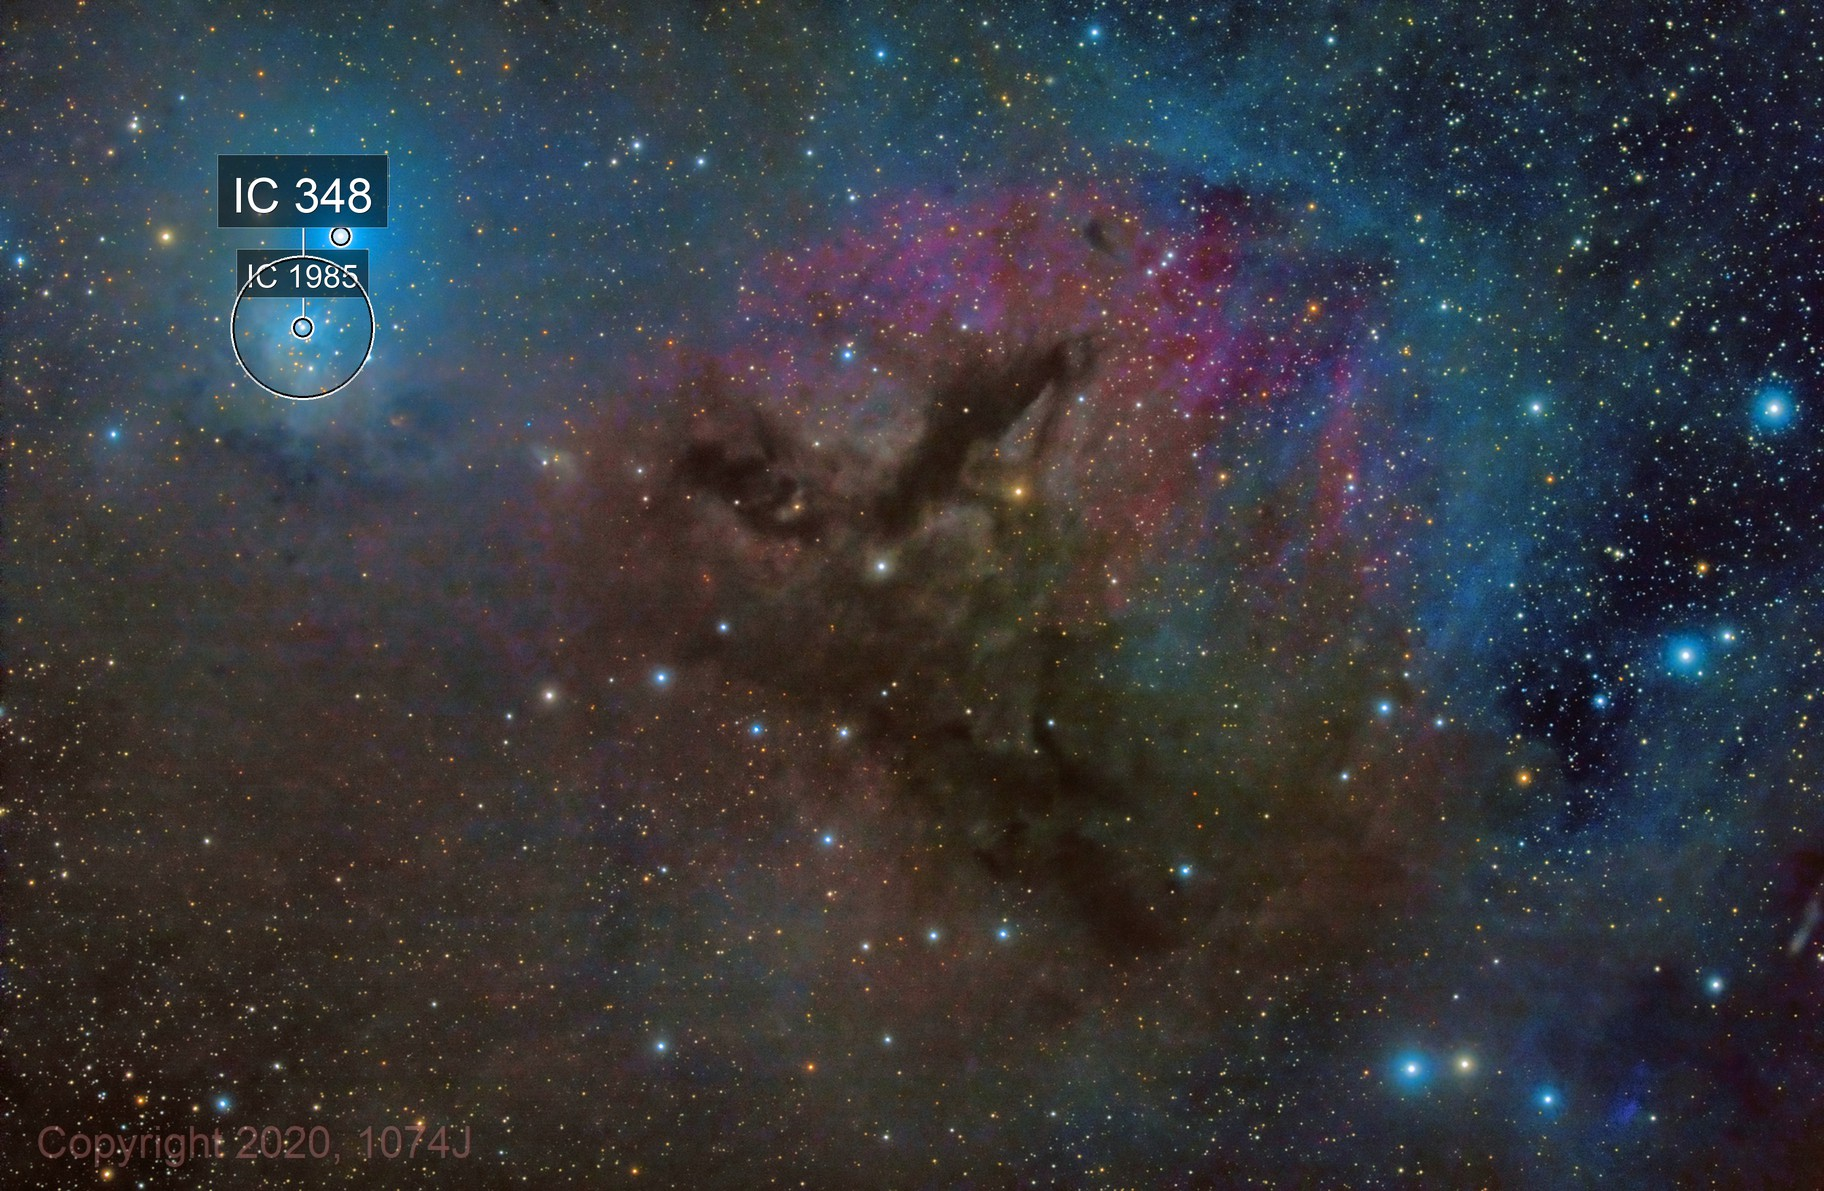 LBN 749, IC 348